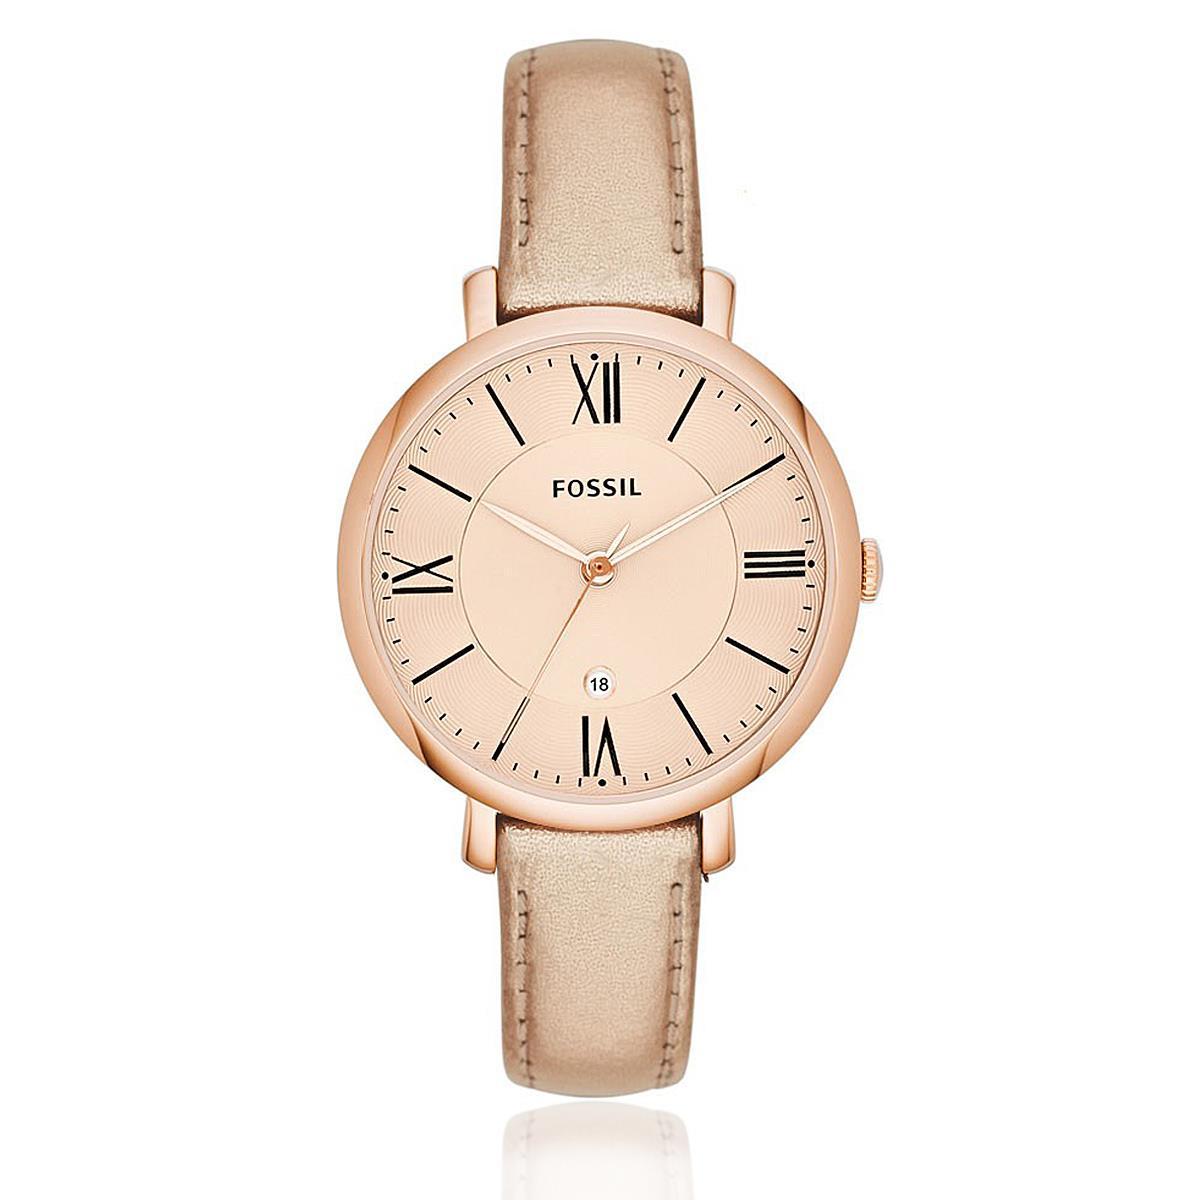 Relógio Feminino Fossil Jacqueline Three-Hand Analógico ES3438  2TN Rose 58c2bd8ab3